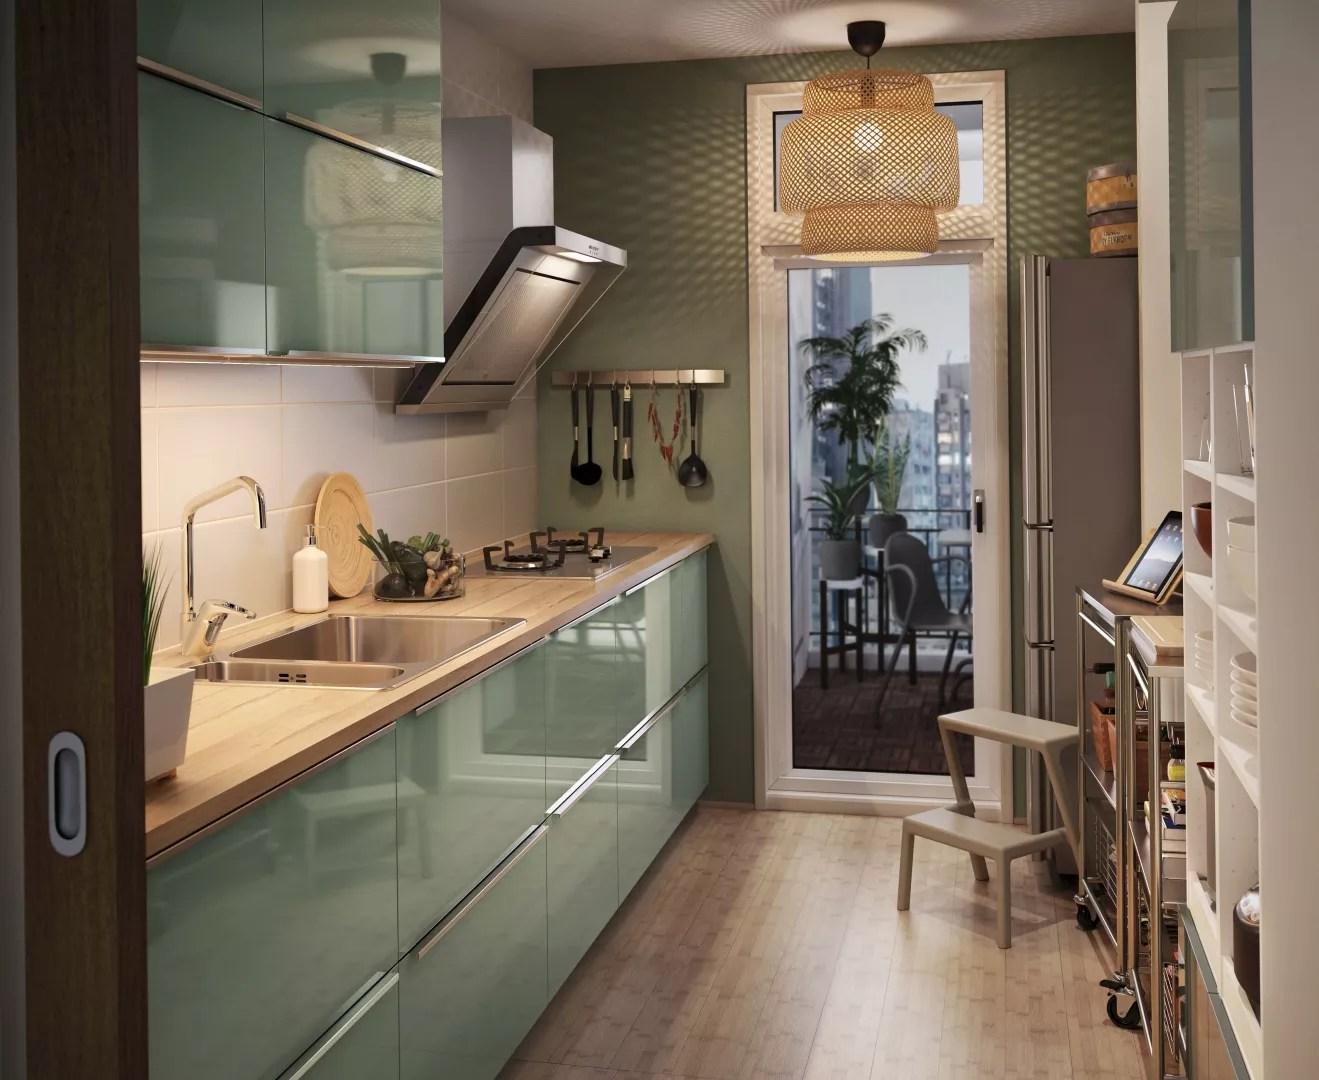 Interieur ikea lanceert design keuken met karakter for Keuken samenstellen ikea